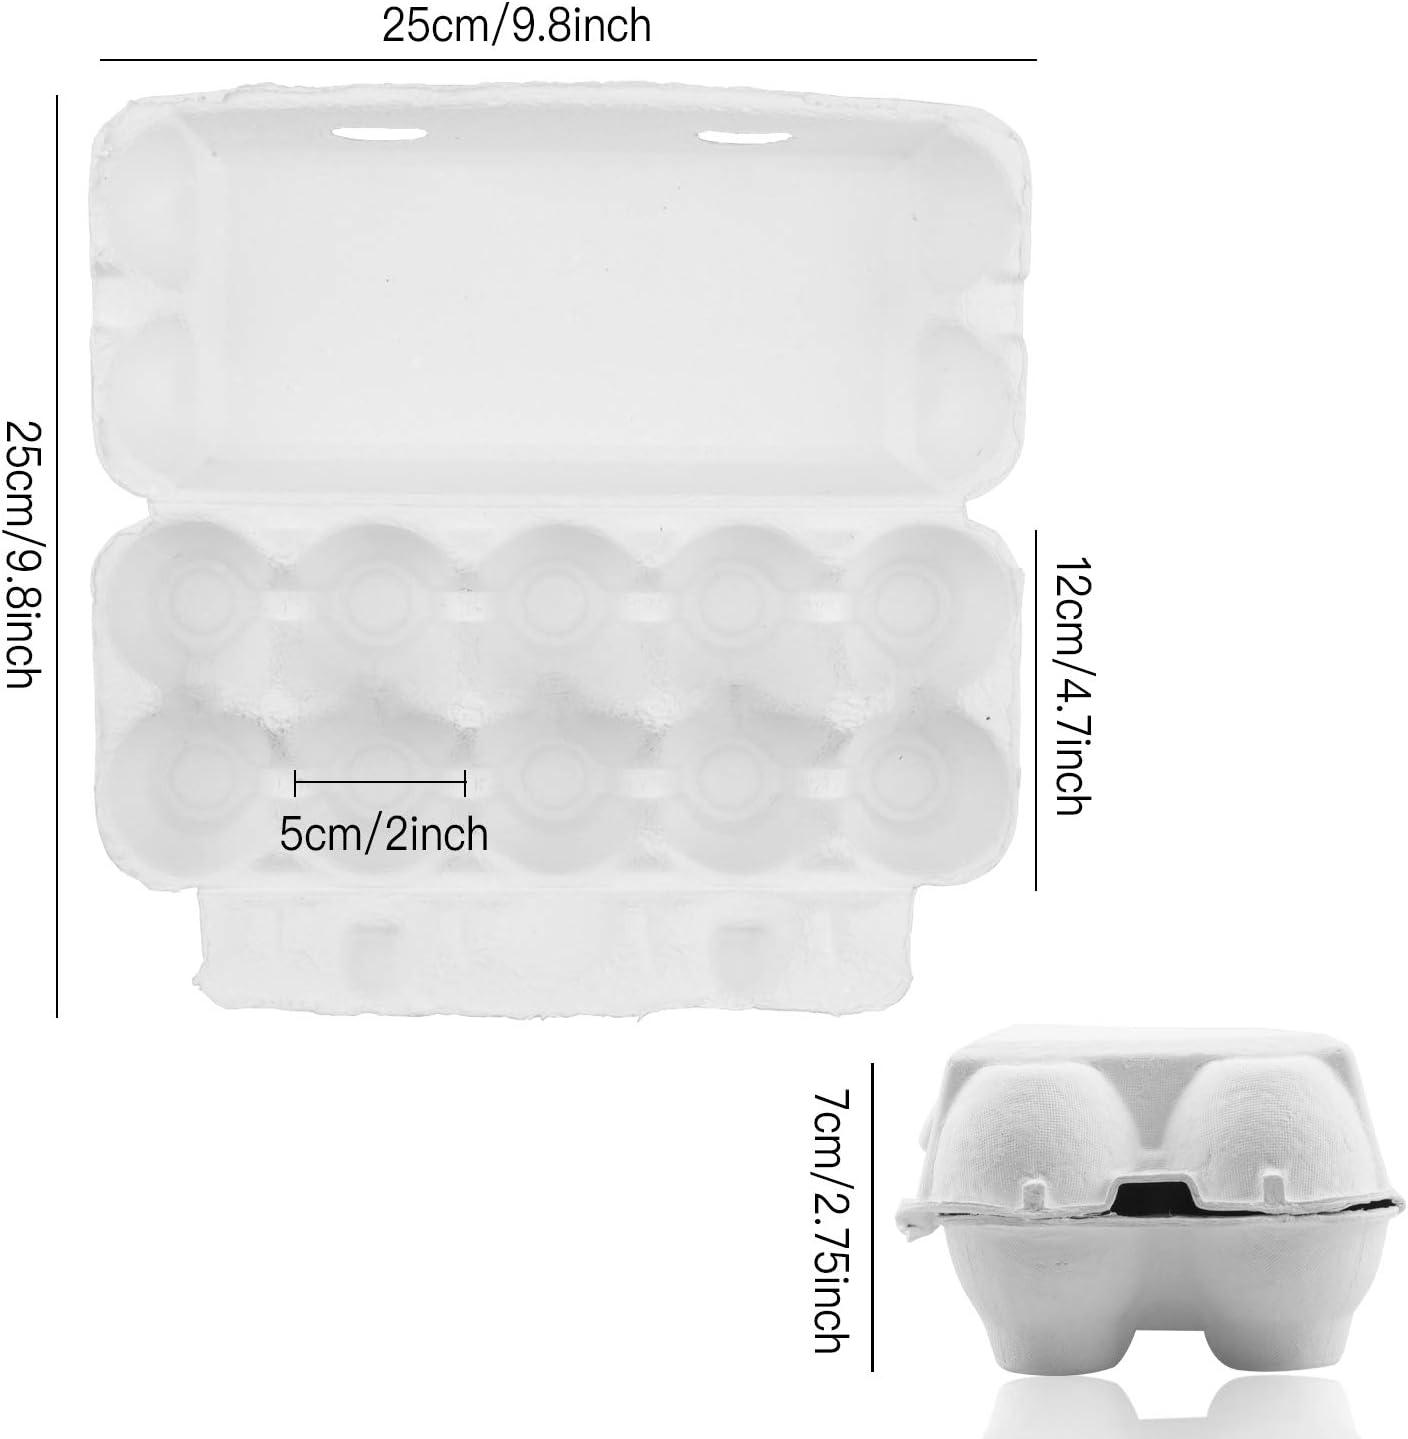 10 Cell 20 Pack Empty Egg Cartons,Biodegradable Egg Holders Egg carton farm Freshies Empty Egg Cartons